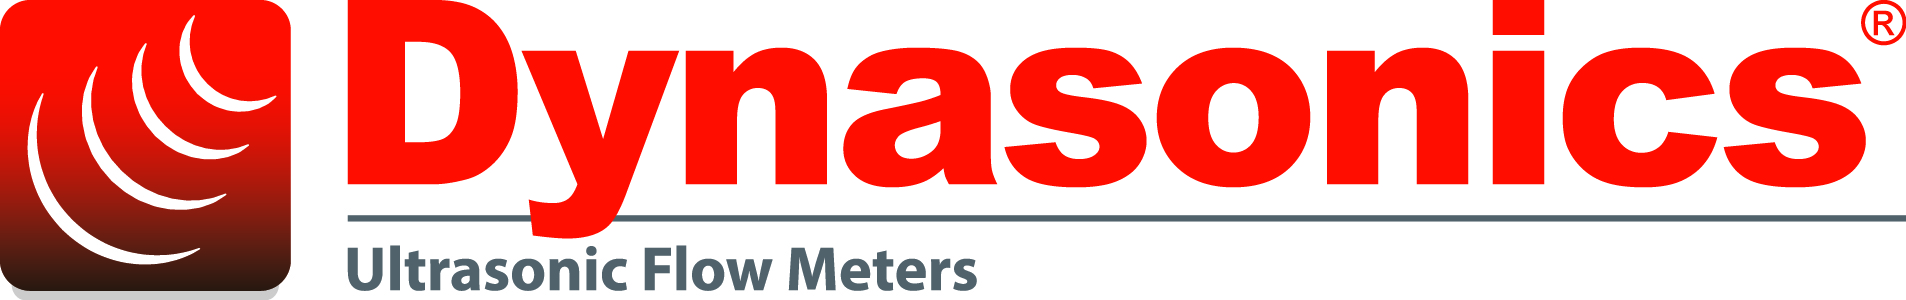 Dynasonics ultrasonic flow meters logo